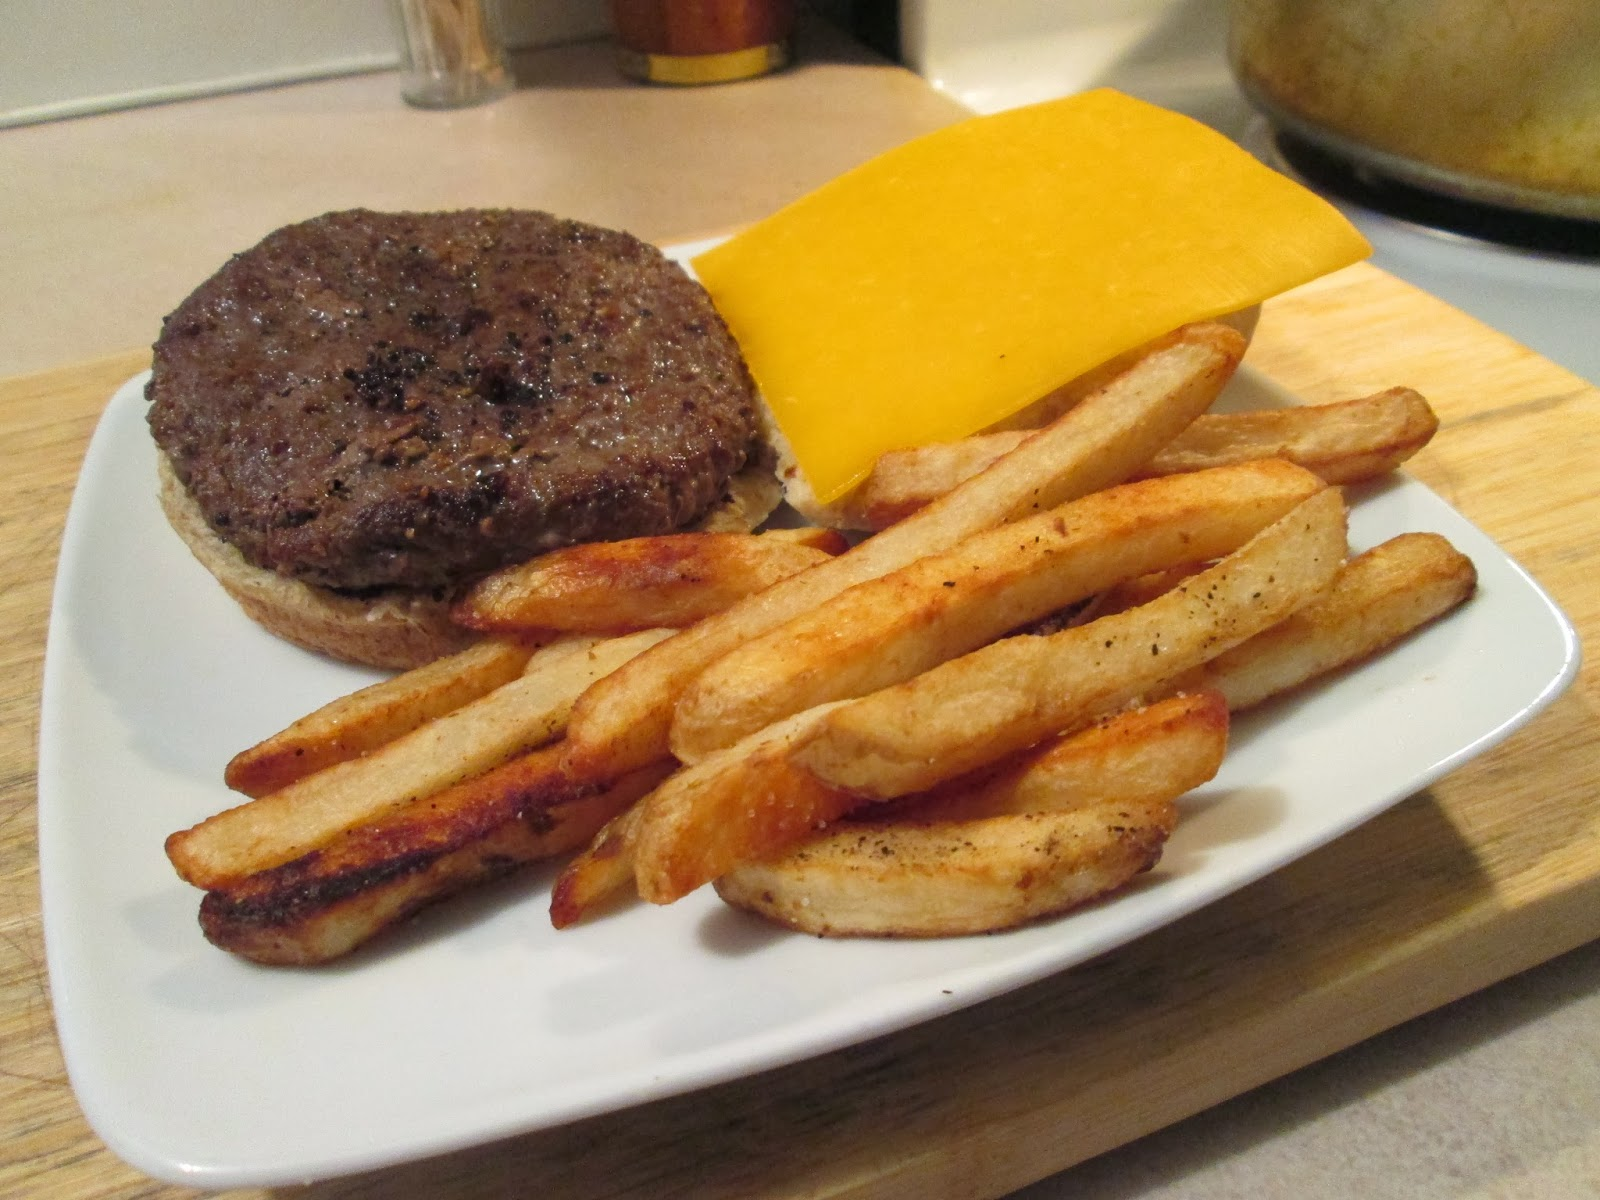 Diab2Cook: Sharp Cheddar Cheese Buffalo Burger w/ Baked Fries